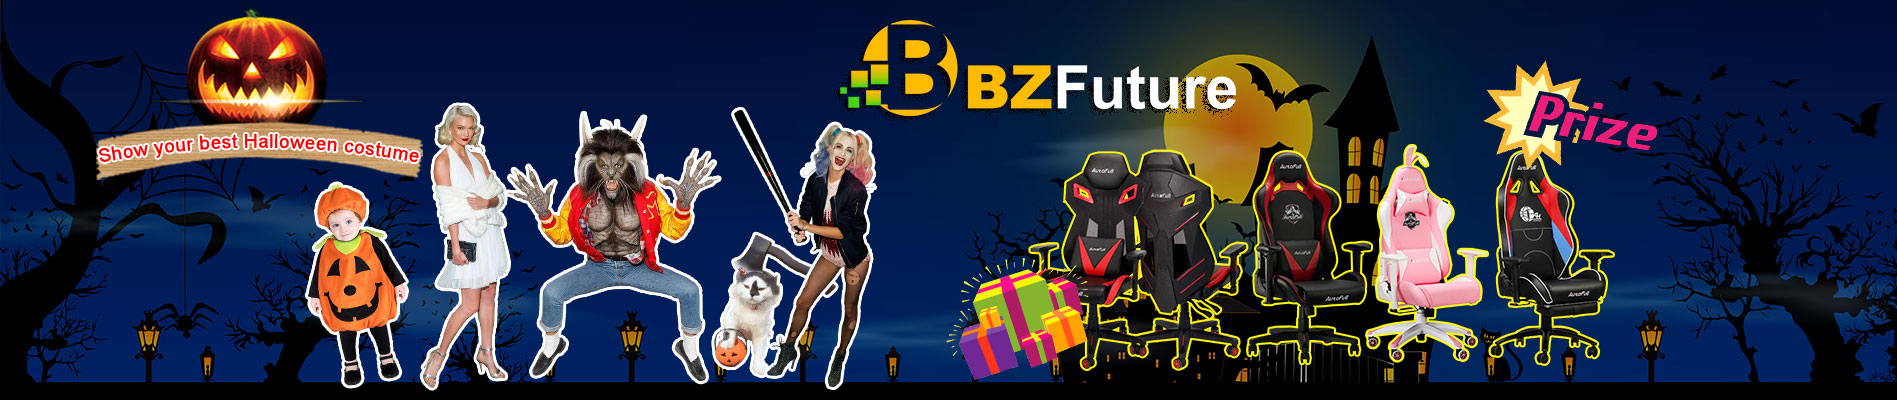 BZFUTURE HALLOWEEN 2019